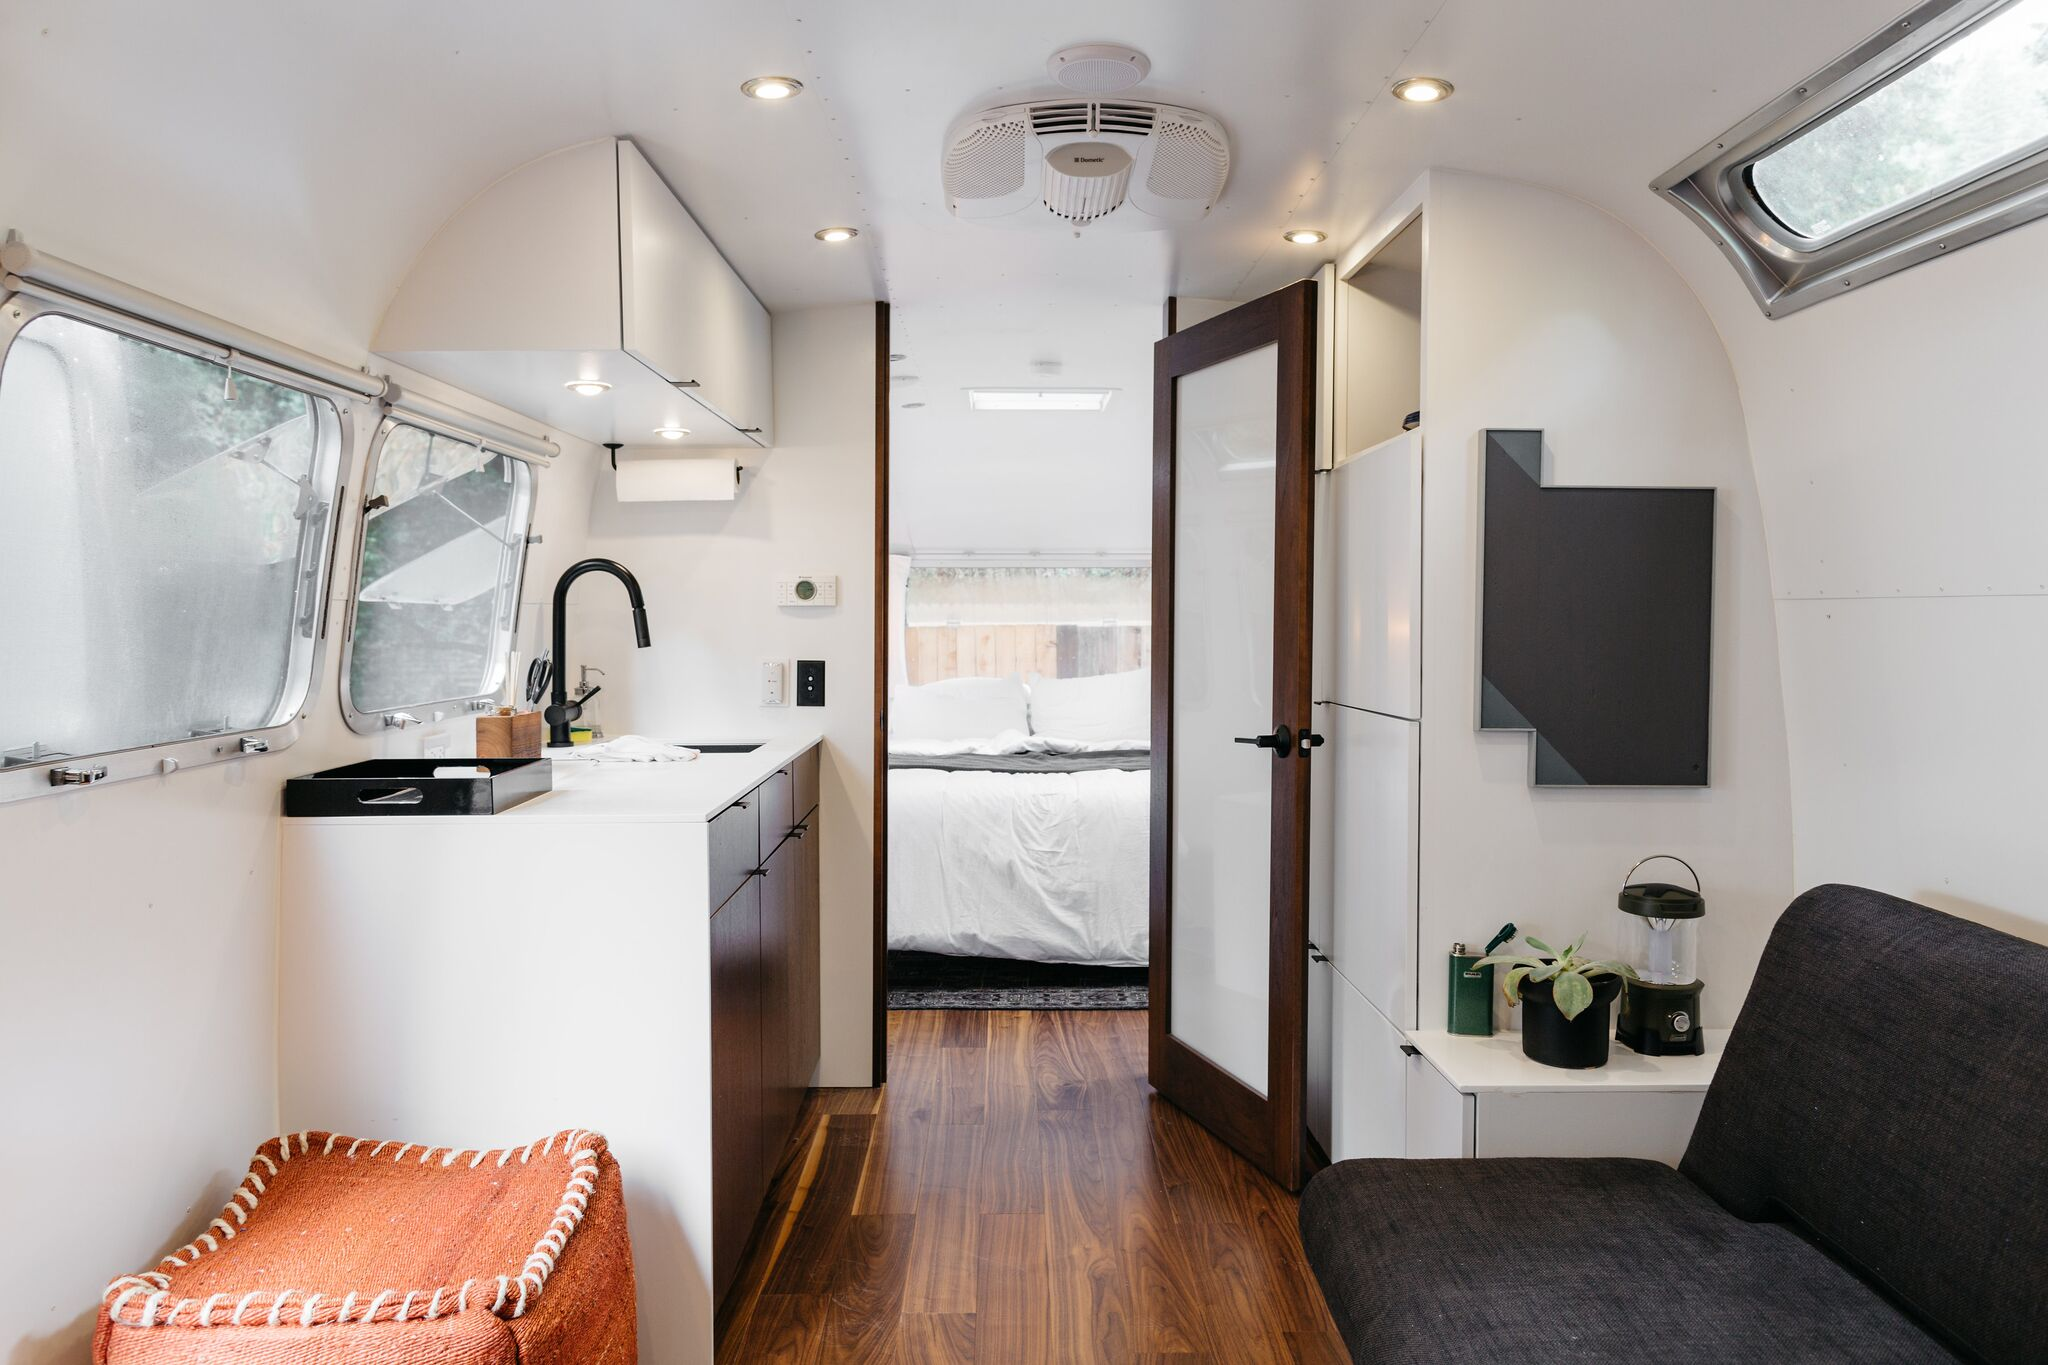 Inside the Airsteam suite #2. Photo Melanie Riccardi